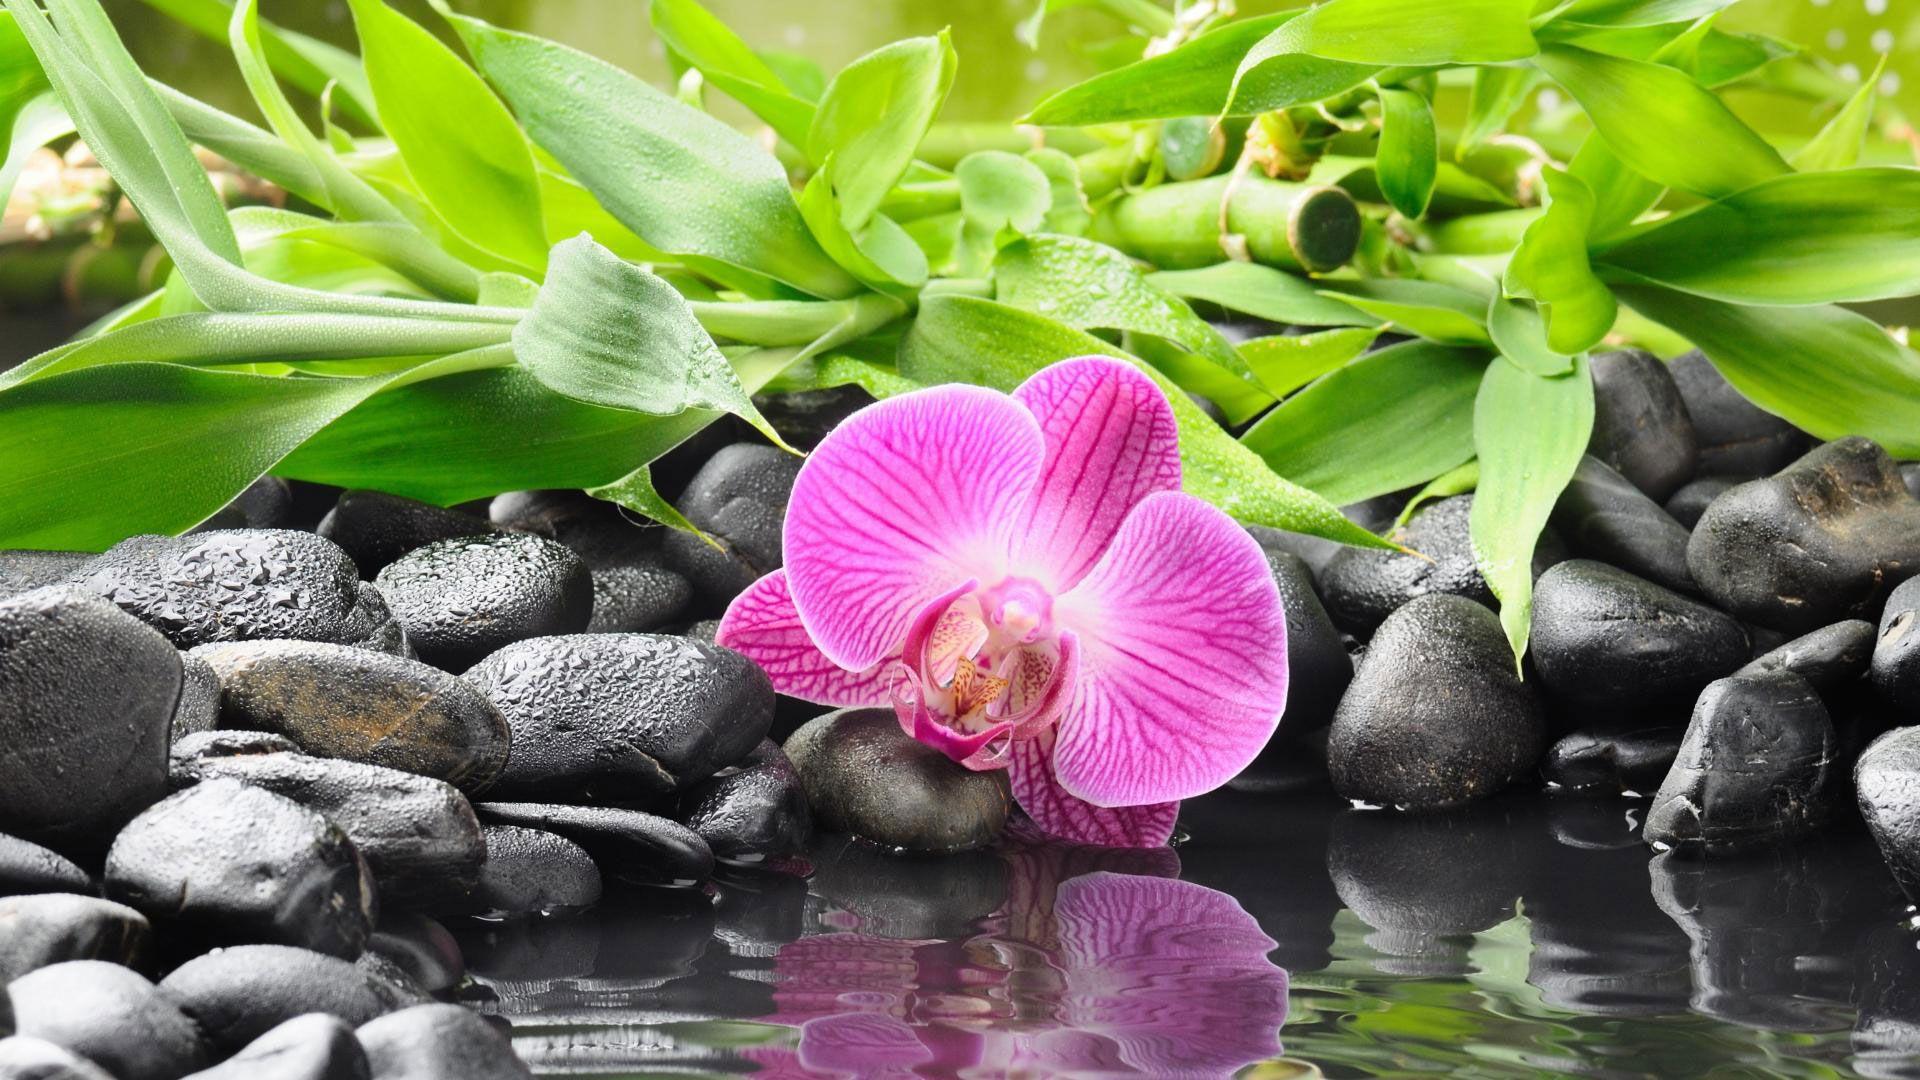 Hd pics photos attractive best black pebbles orchid water drops